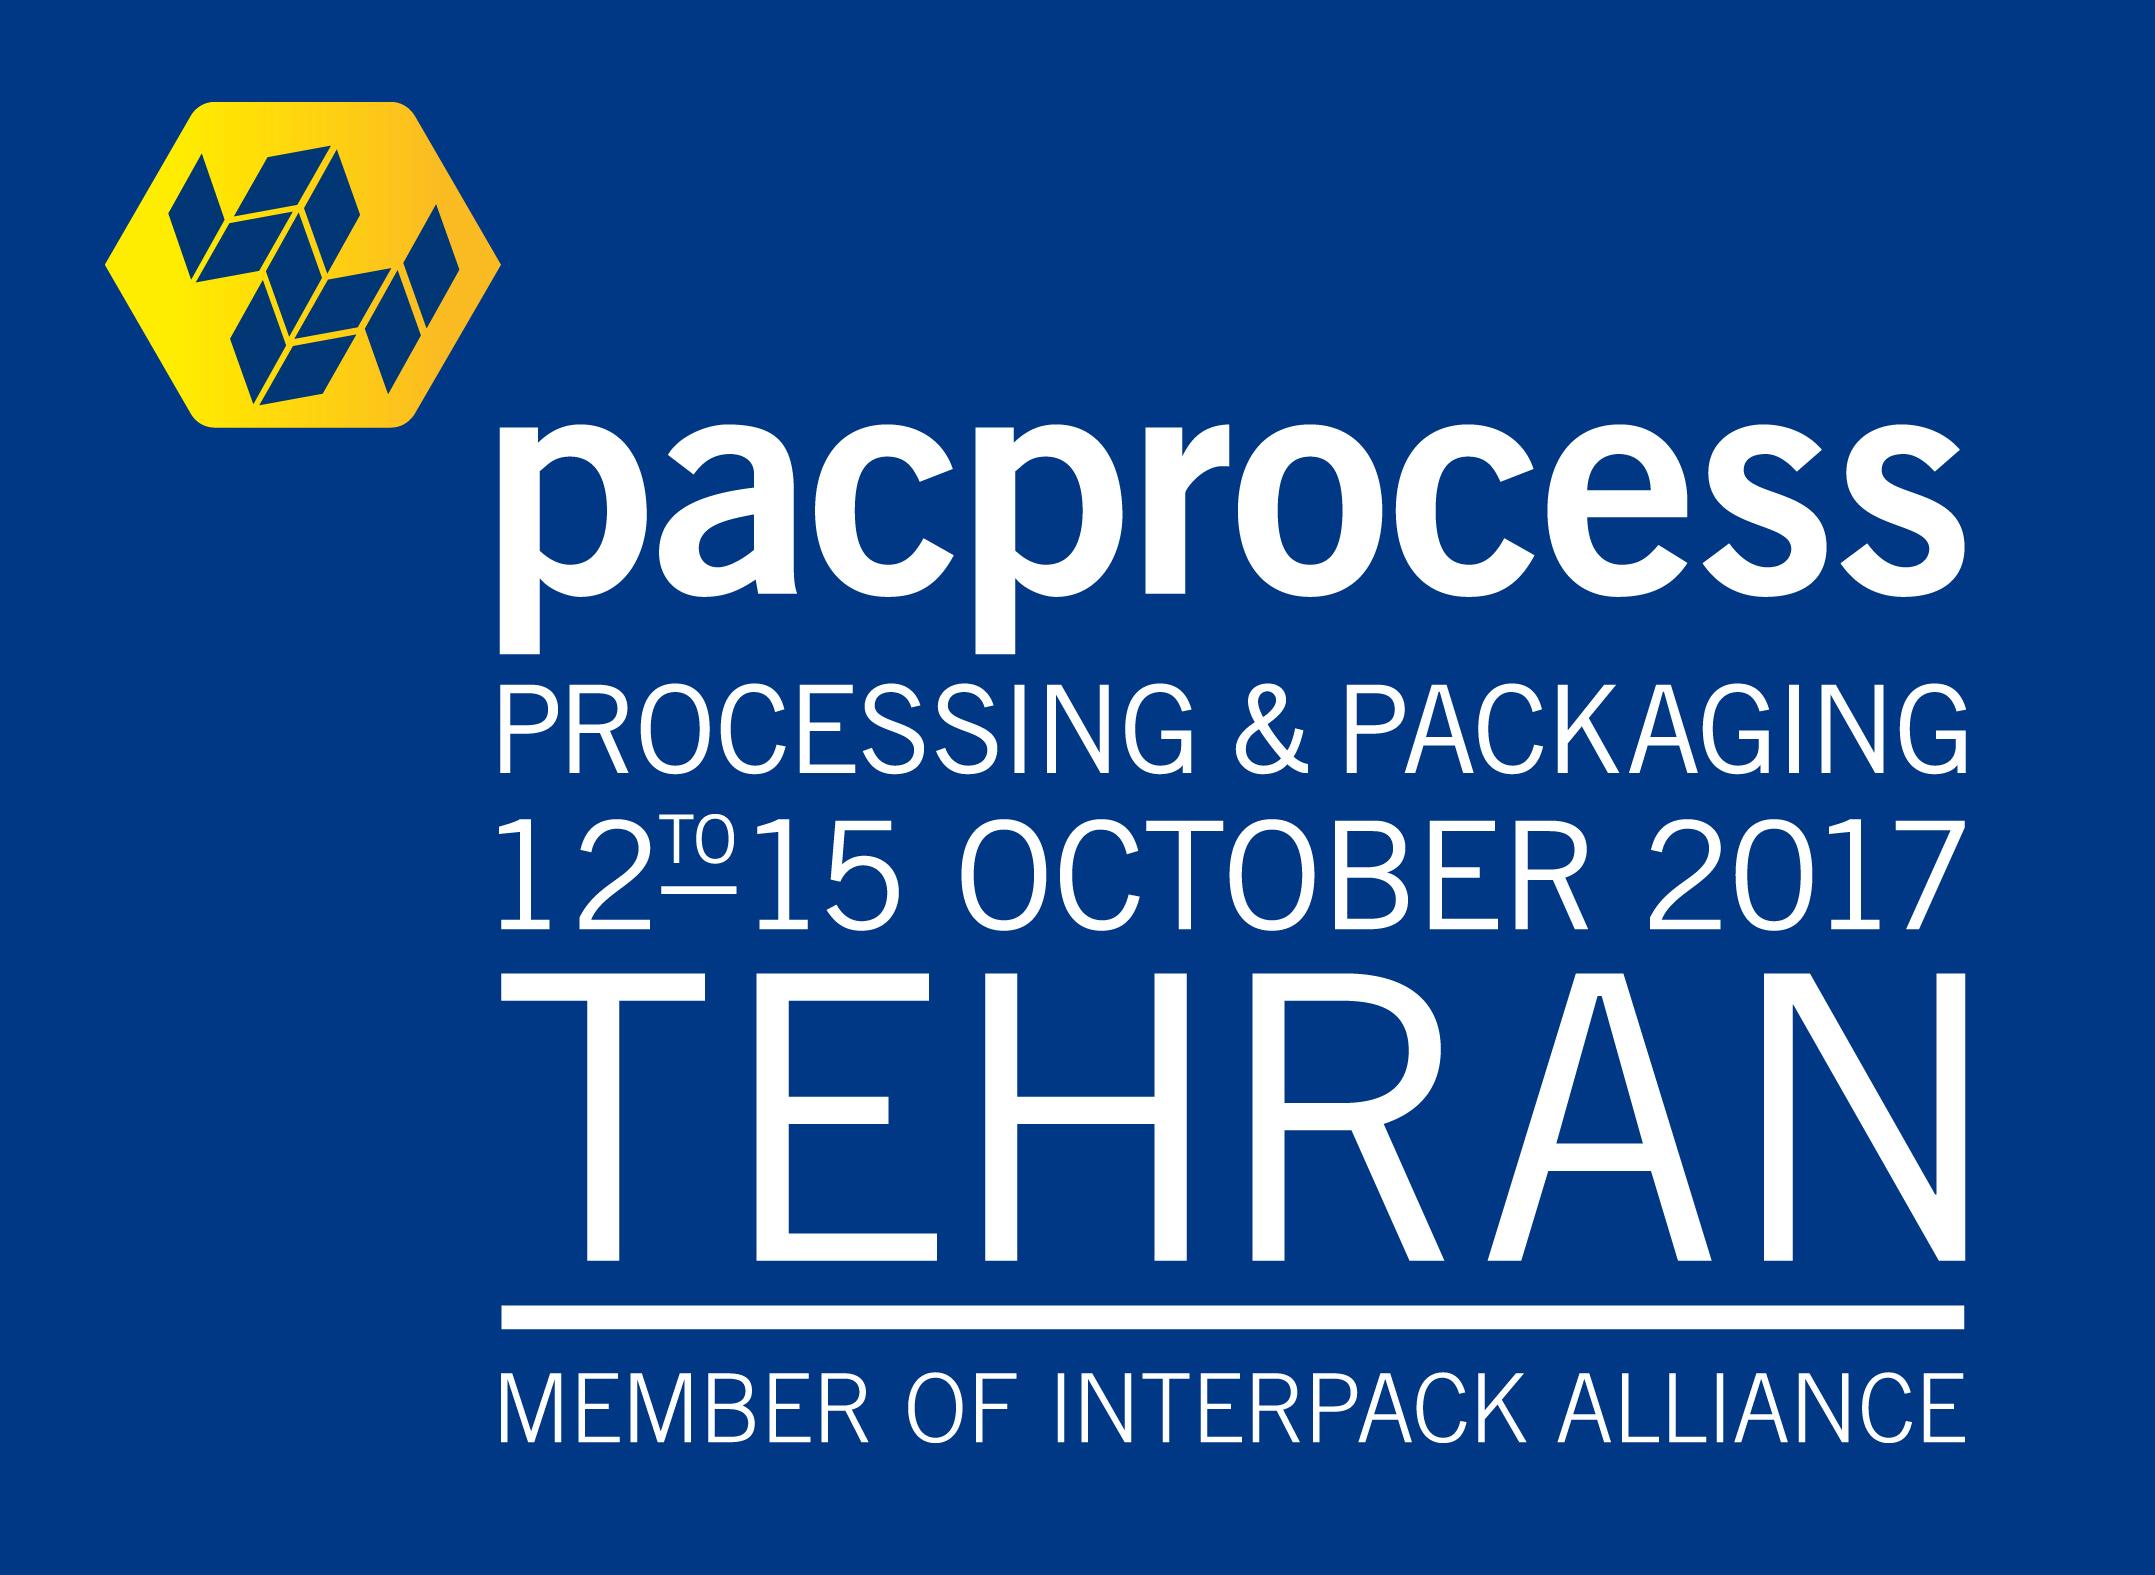 pacprocess Tehran